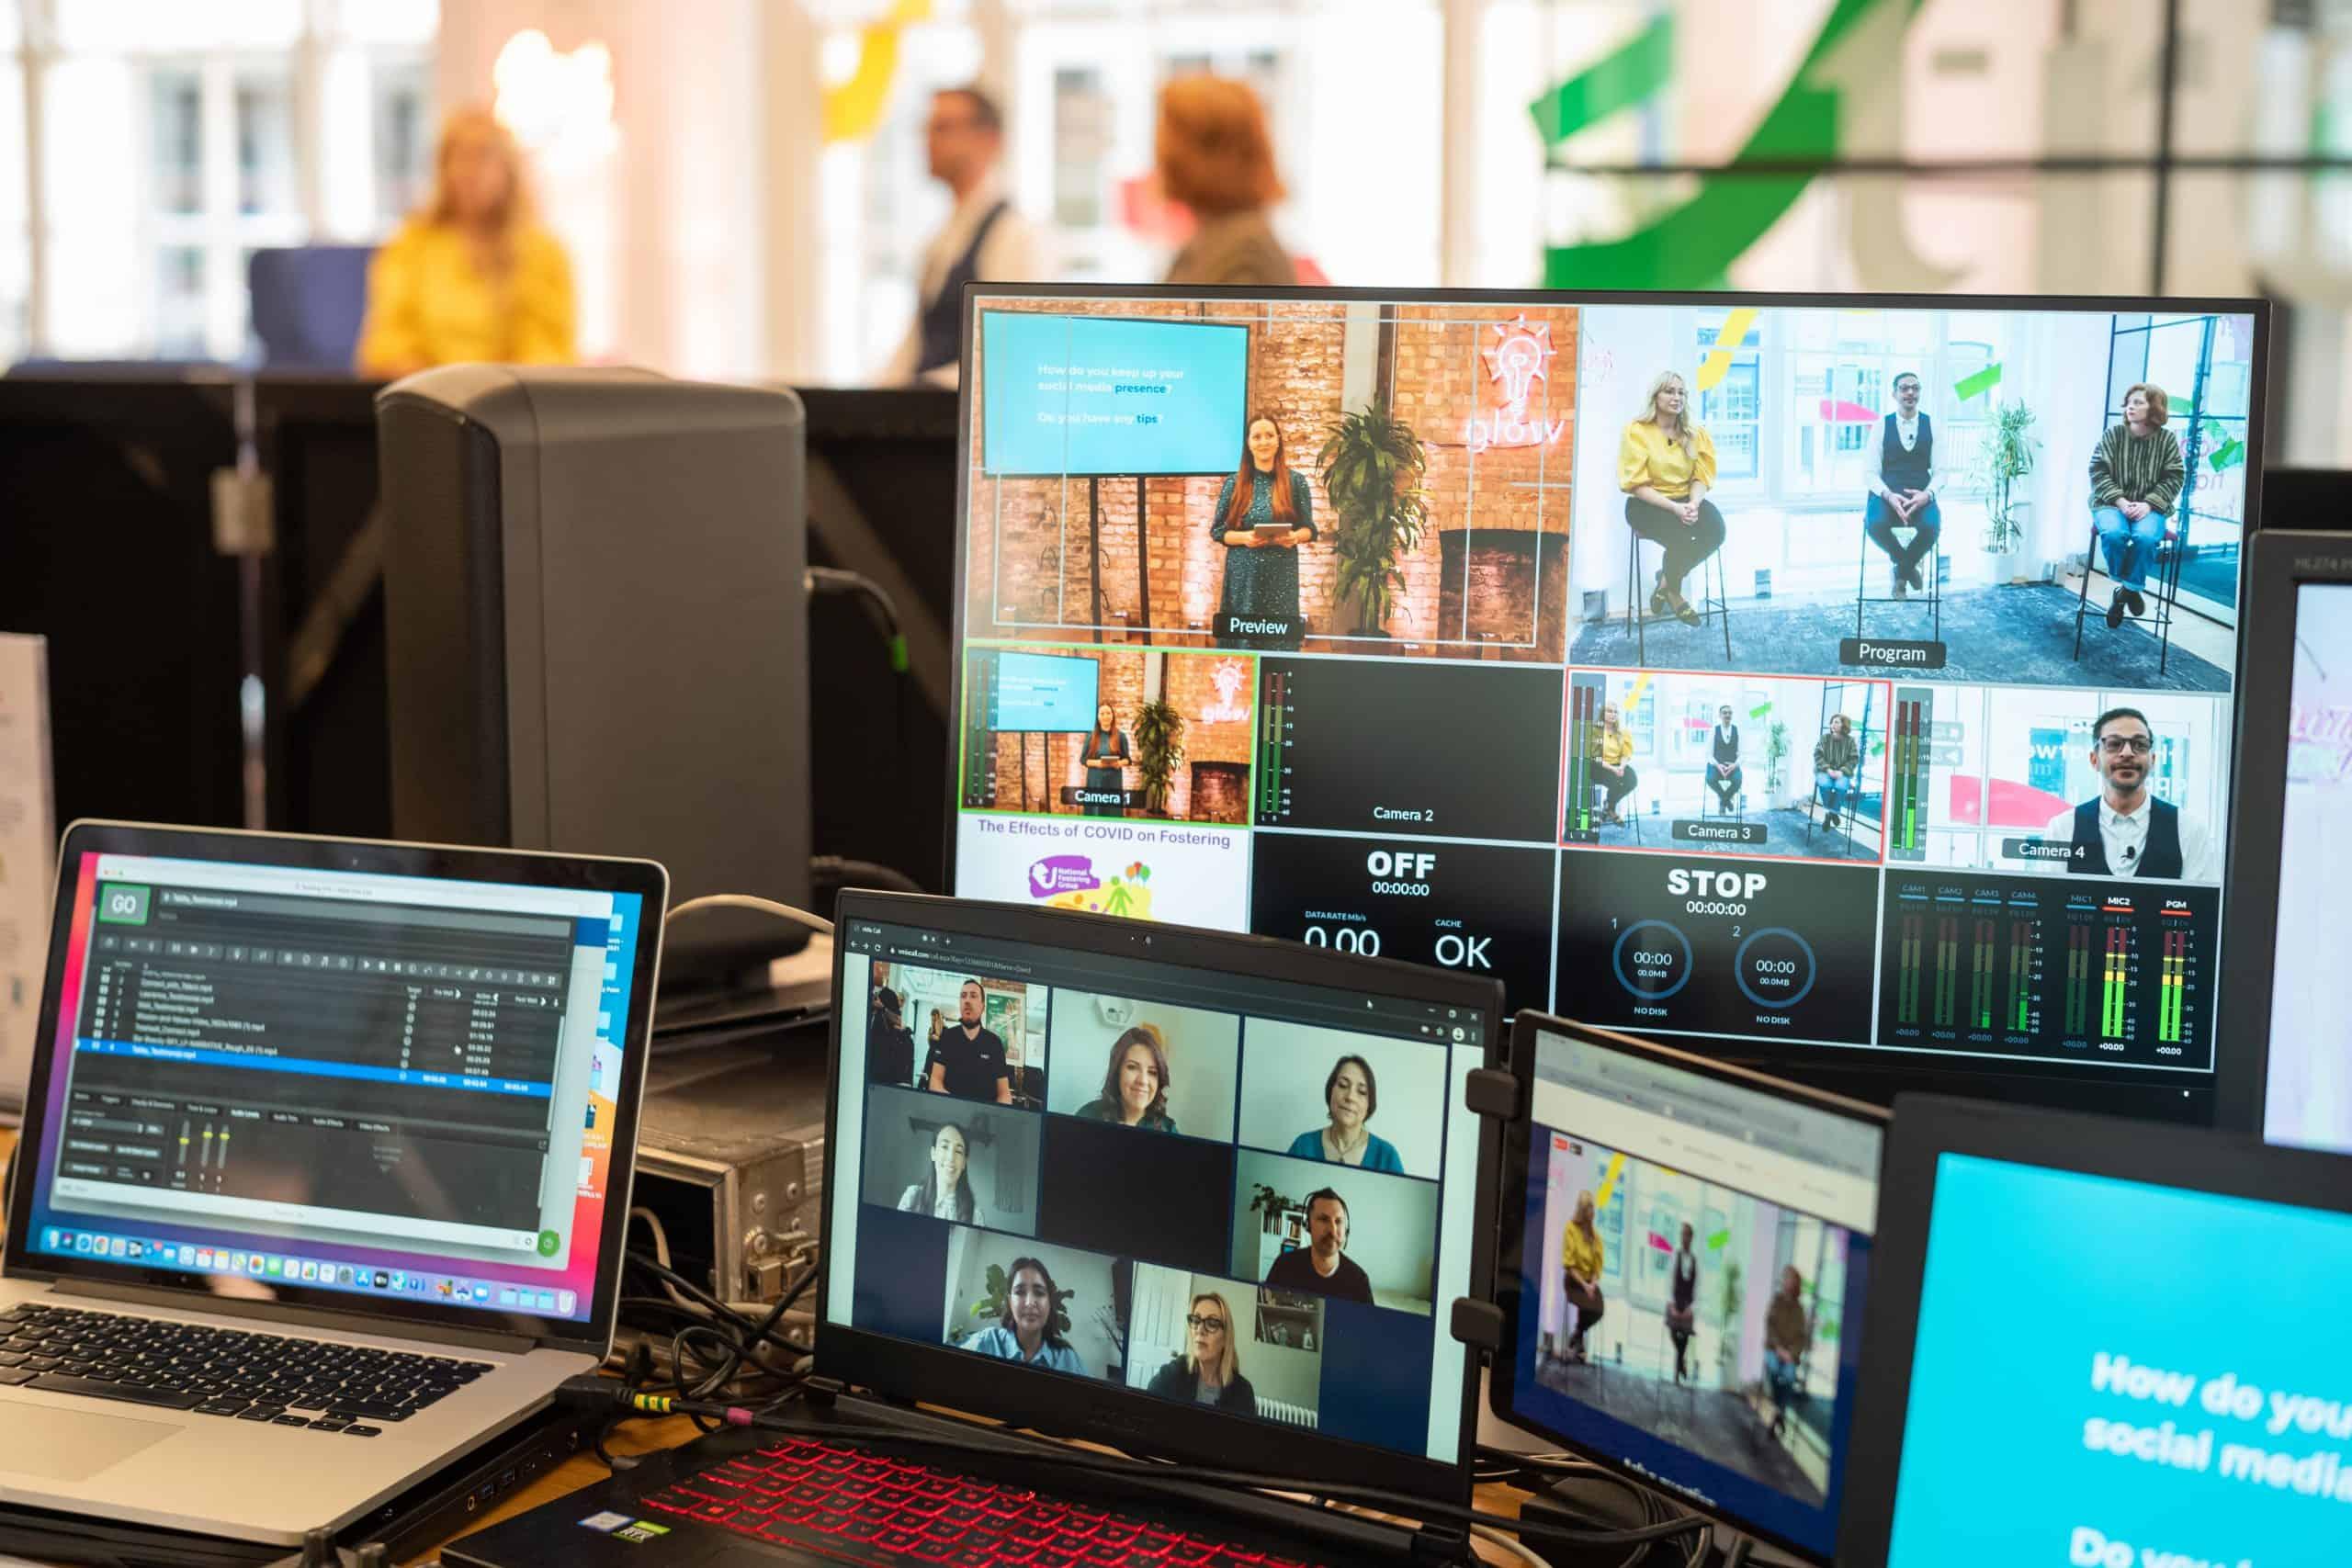 Treatwell Connect Look Forward 2021 Eventify Hybrid event AV tech